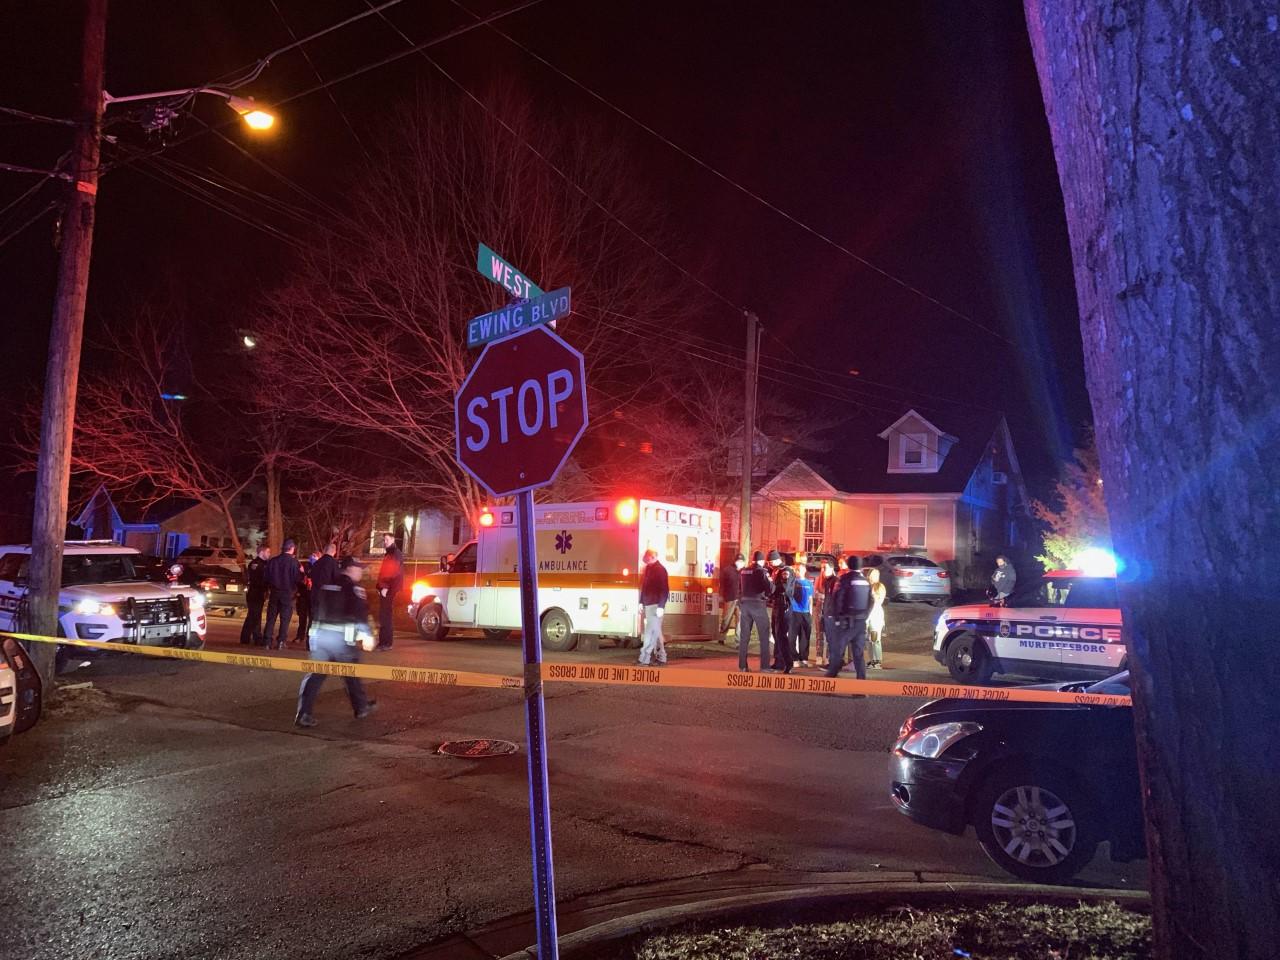 Murfreesboro Ewing Boulevard Party Shooting 1.png